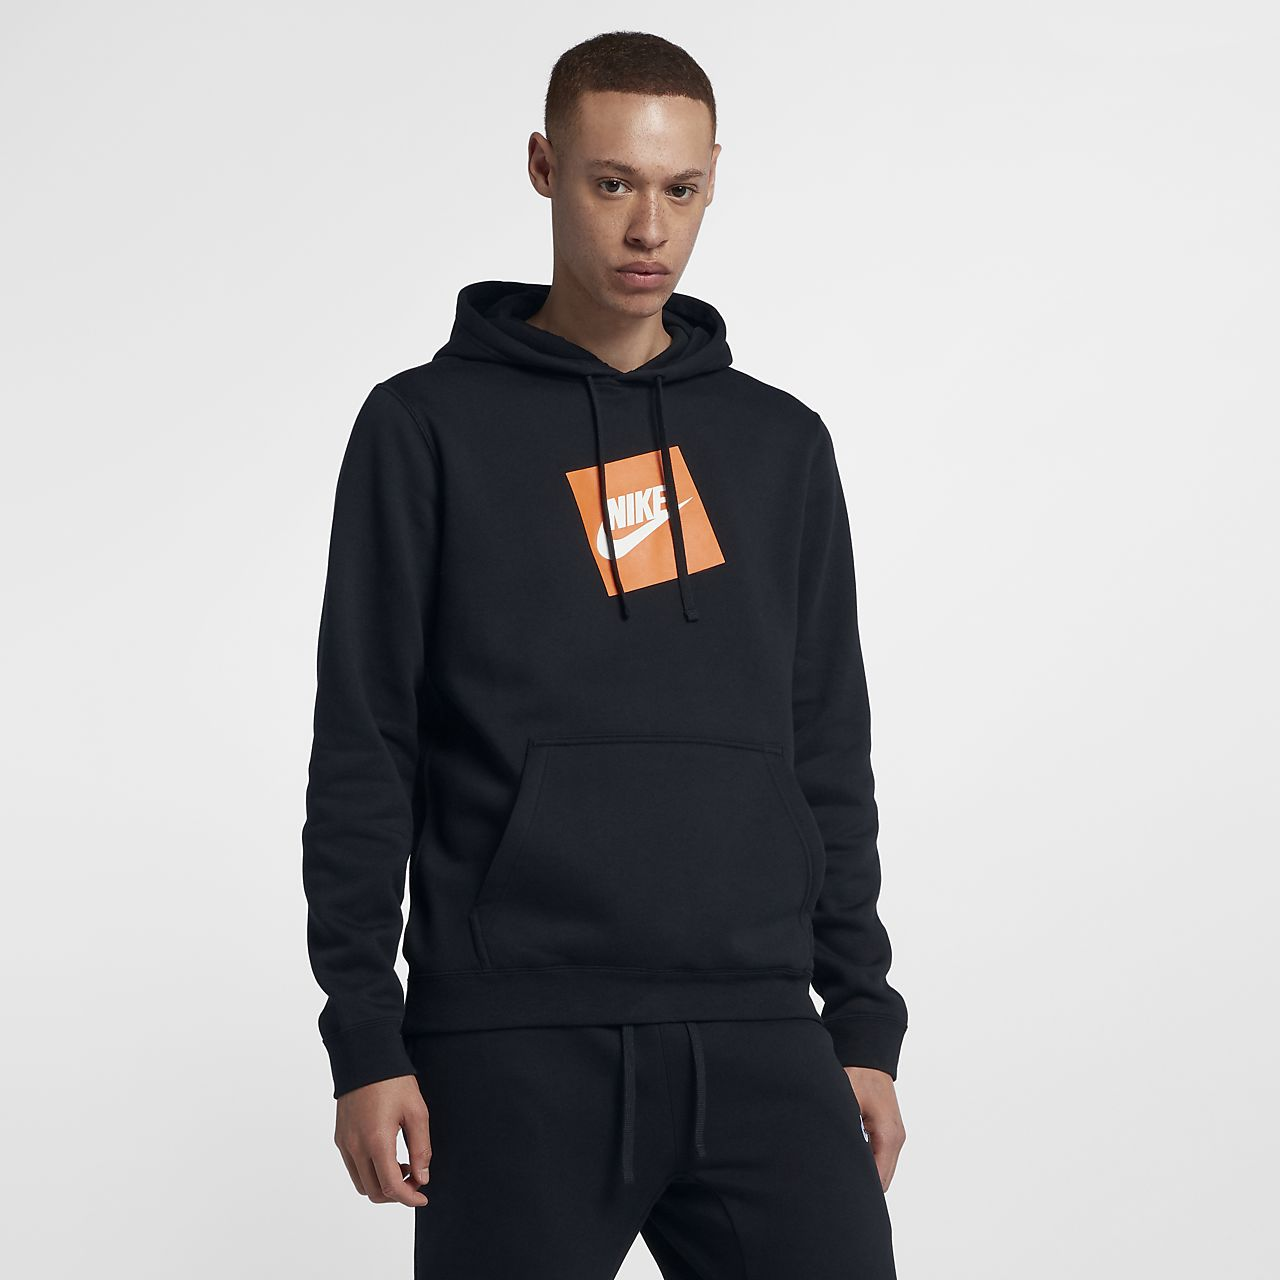 Nike Sportswear Fleece Pullover Hoodie für Herren